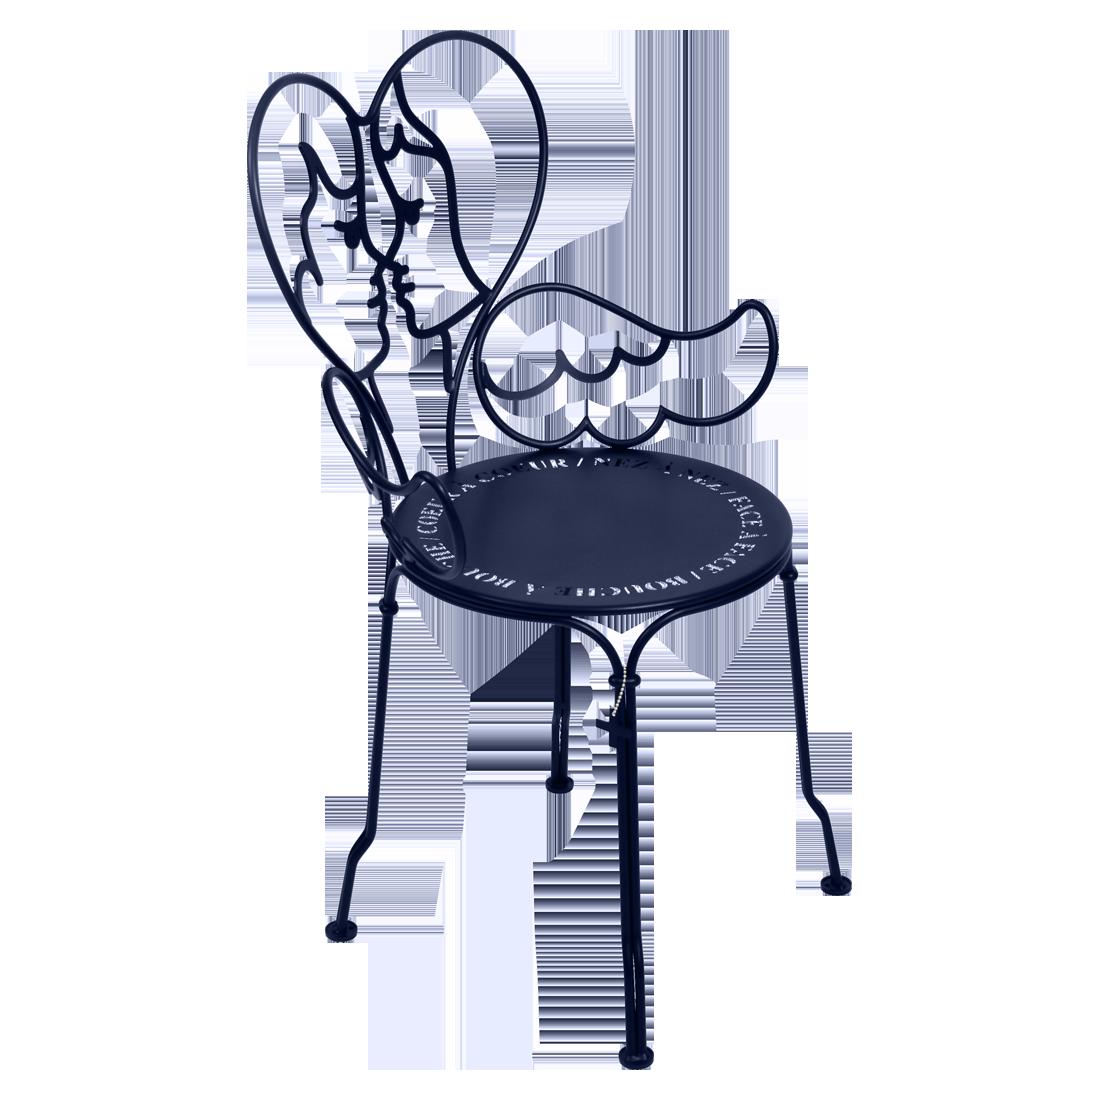 chaise design, chaise castelbajac, chaise metal design, chaise design bleu